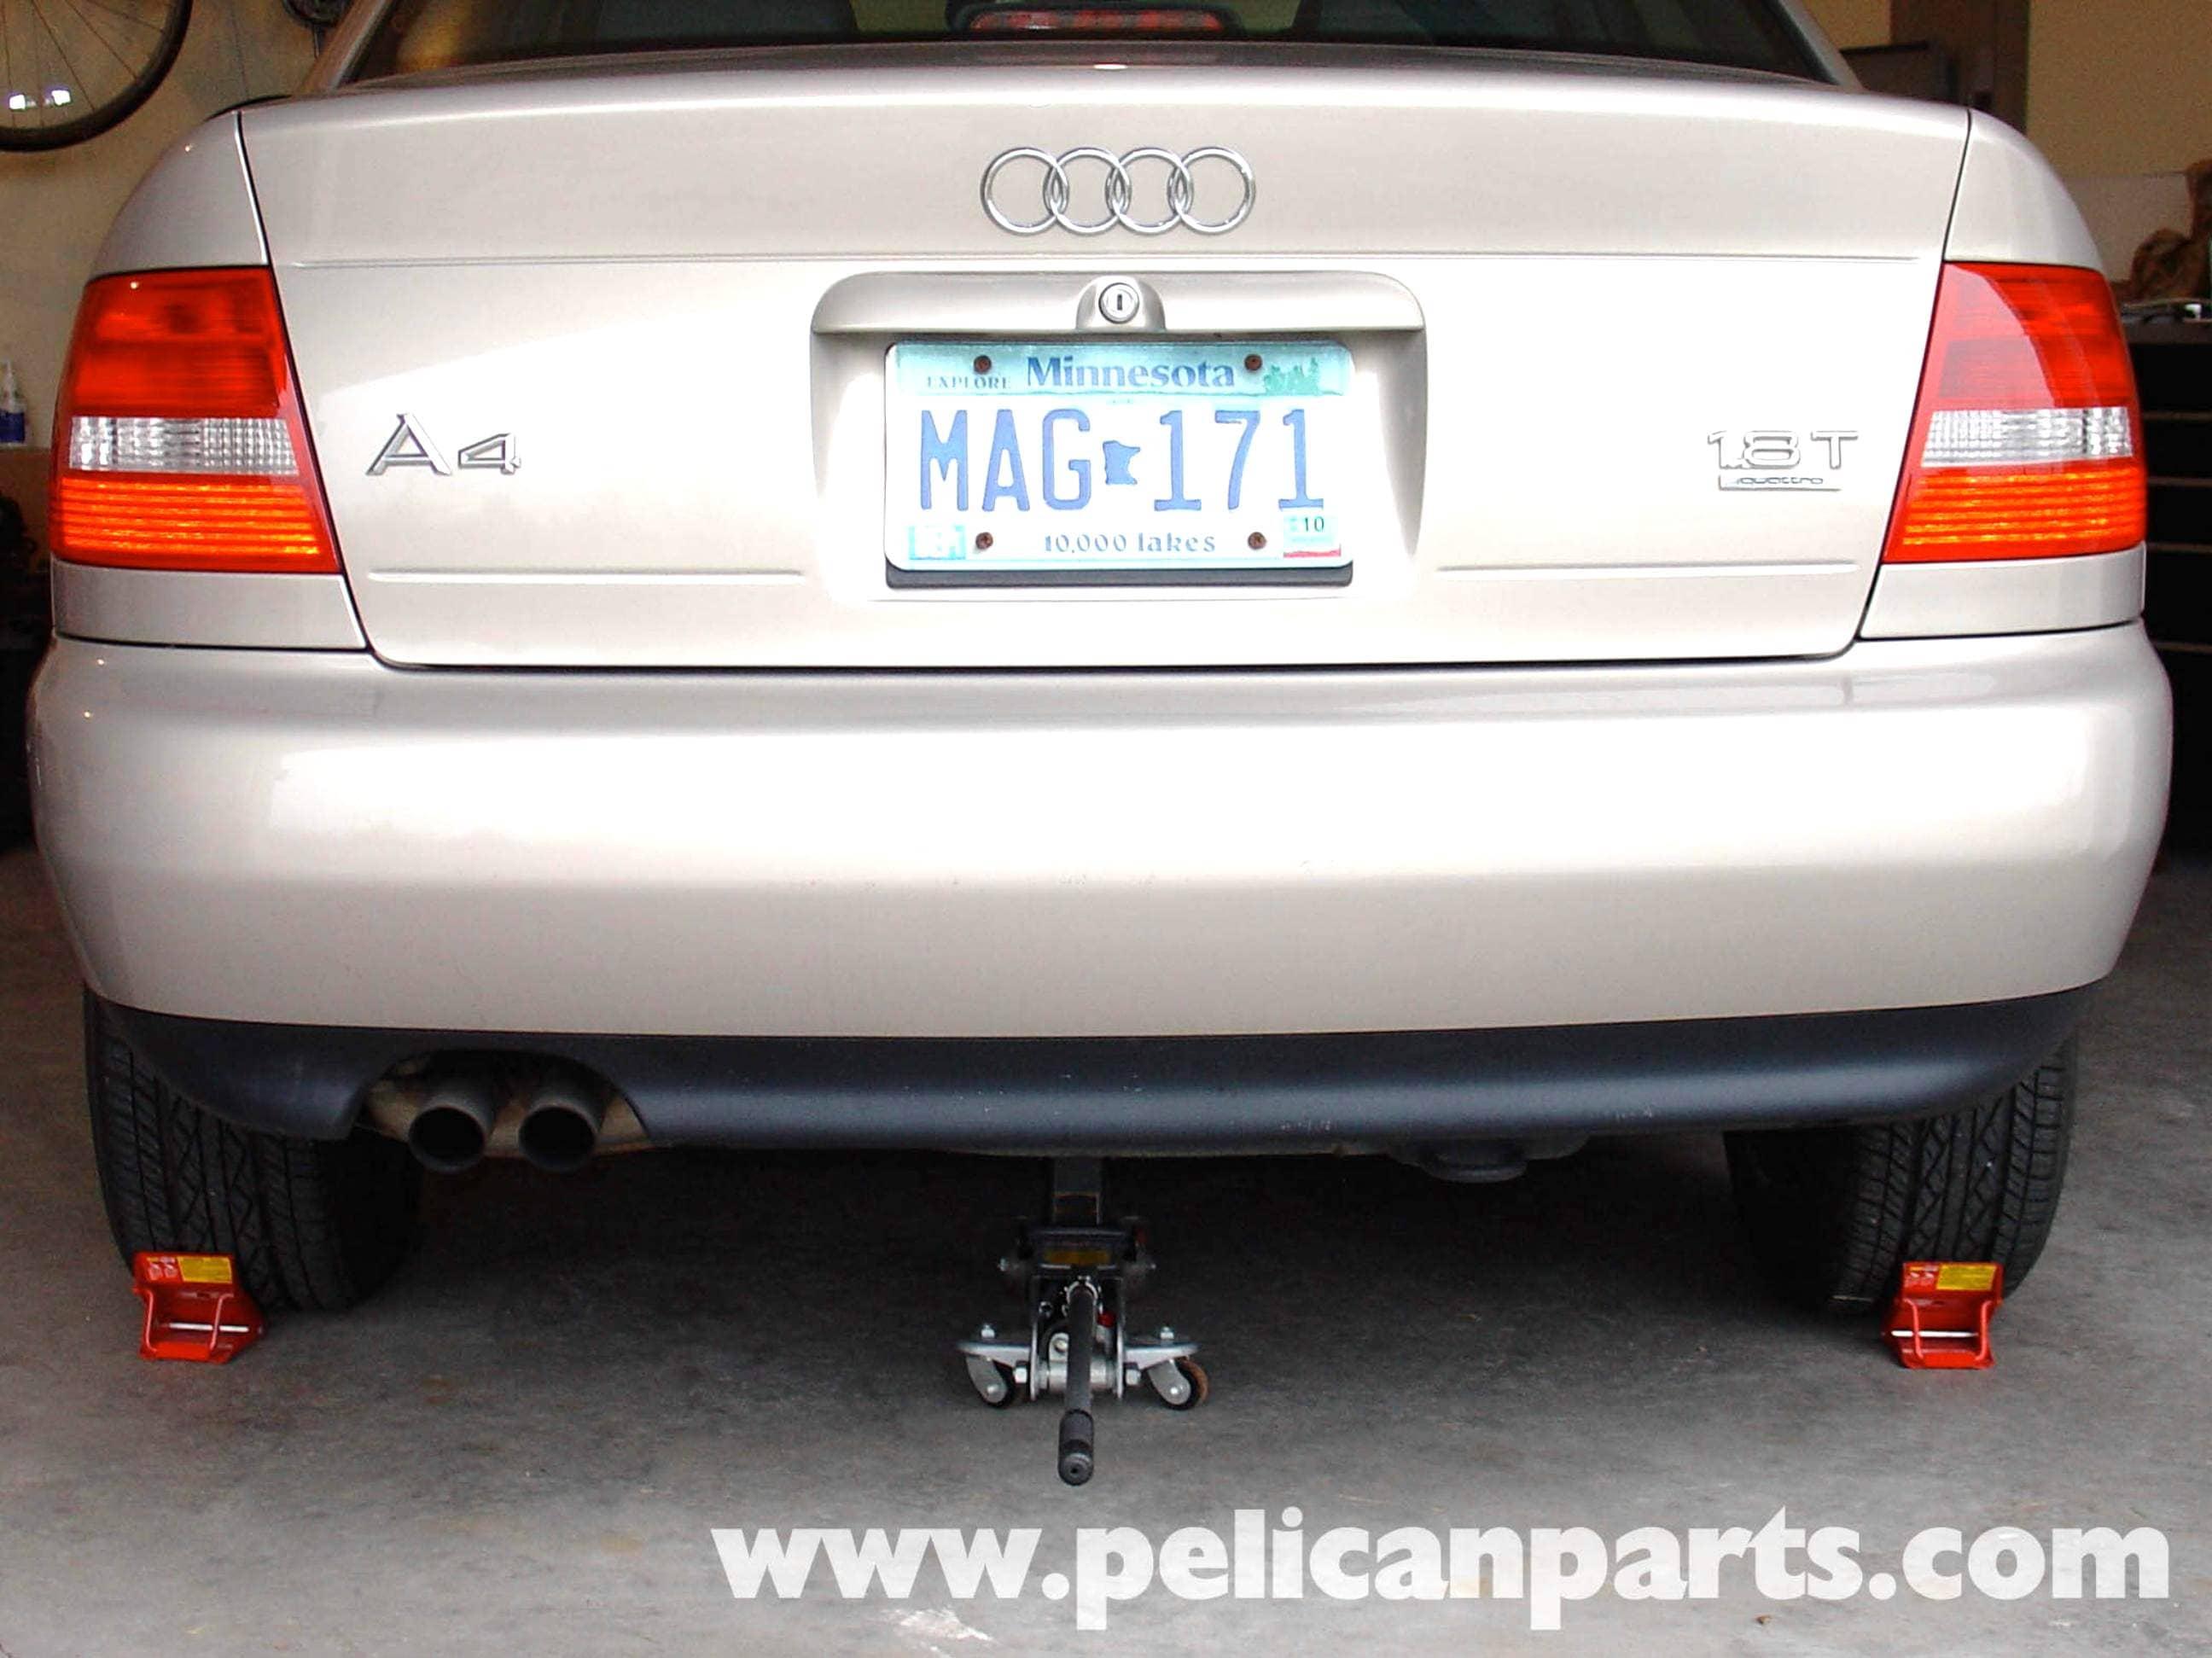 Jacking Up Your Audi A4 18t Golf Jetta Passat Beetle